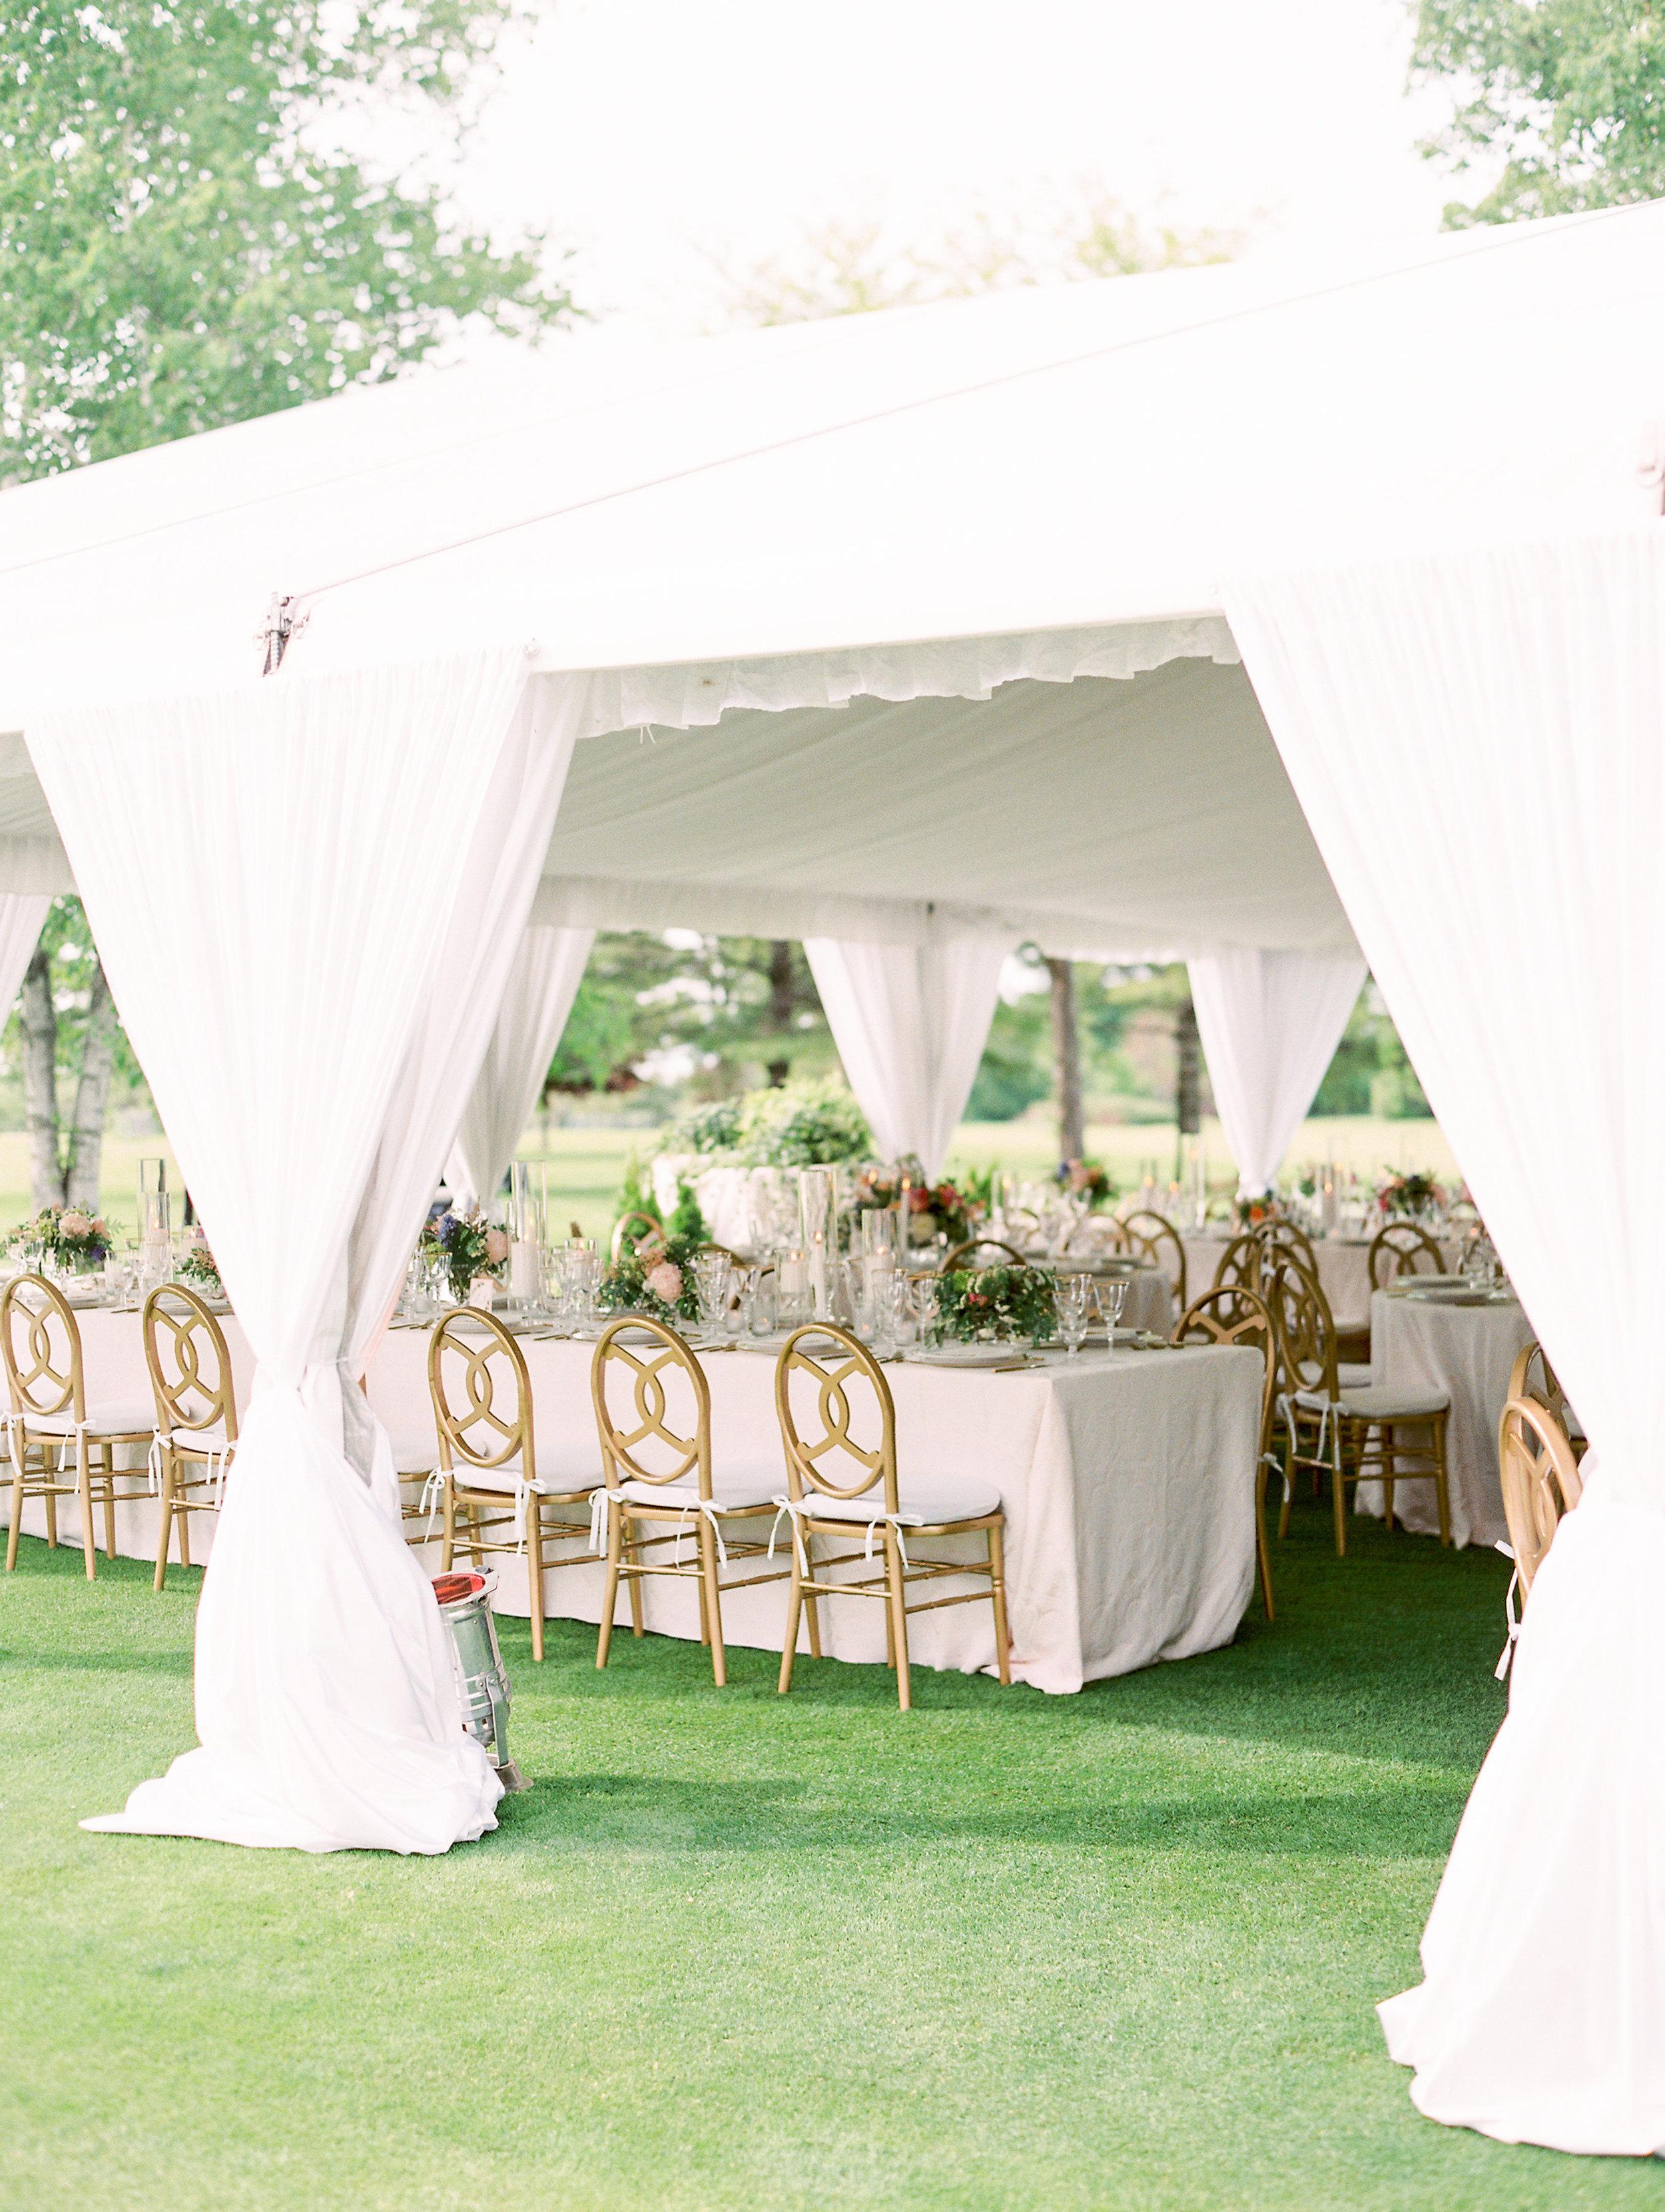 Coffman+Wedding+Reception+Details-76.jpg